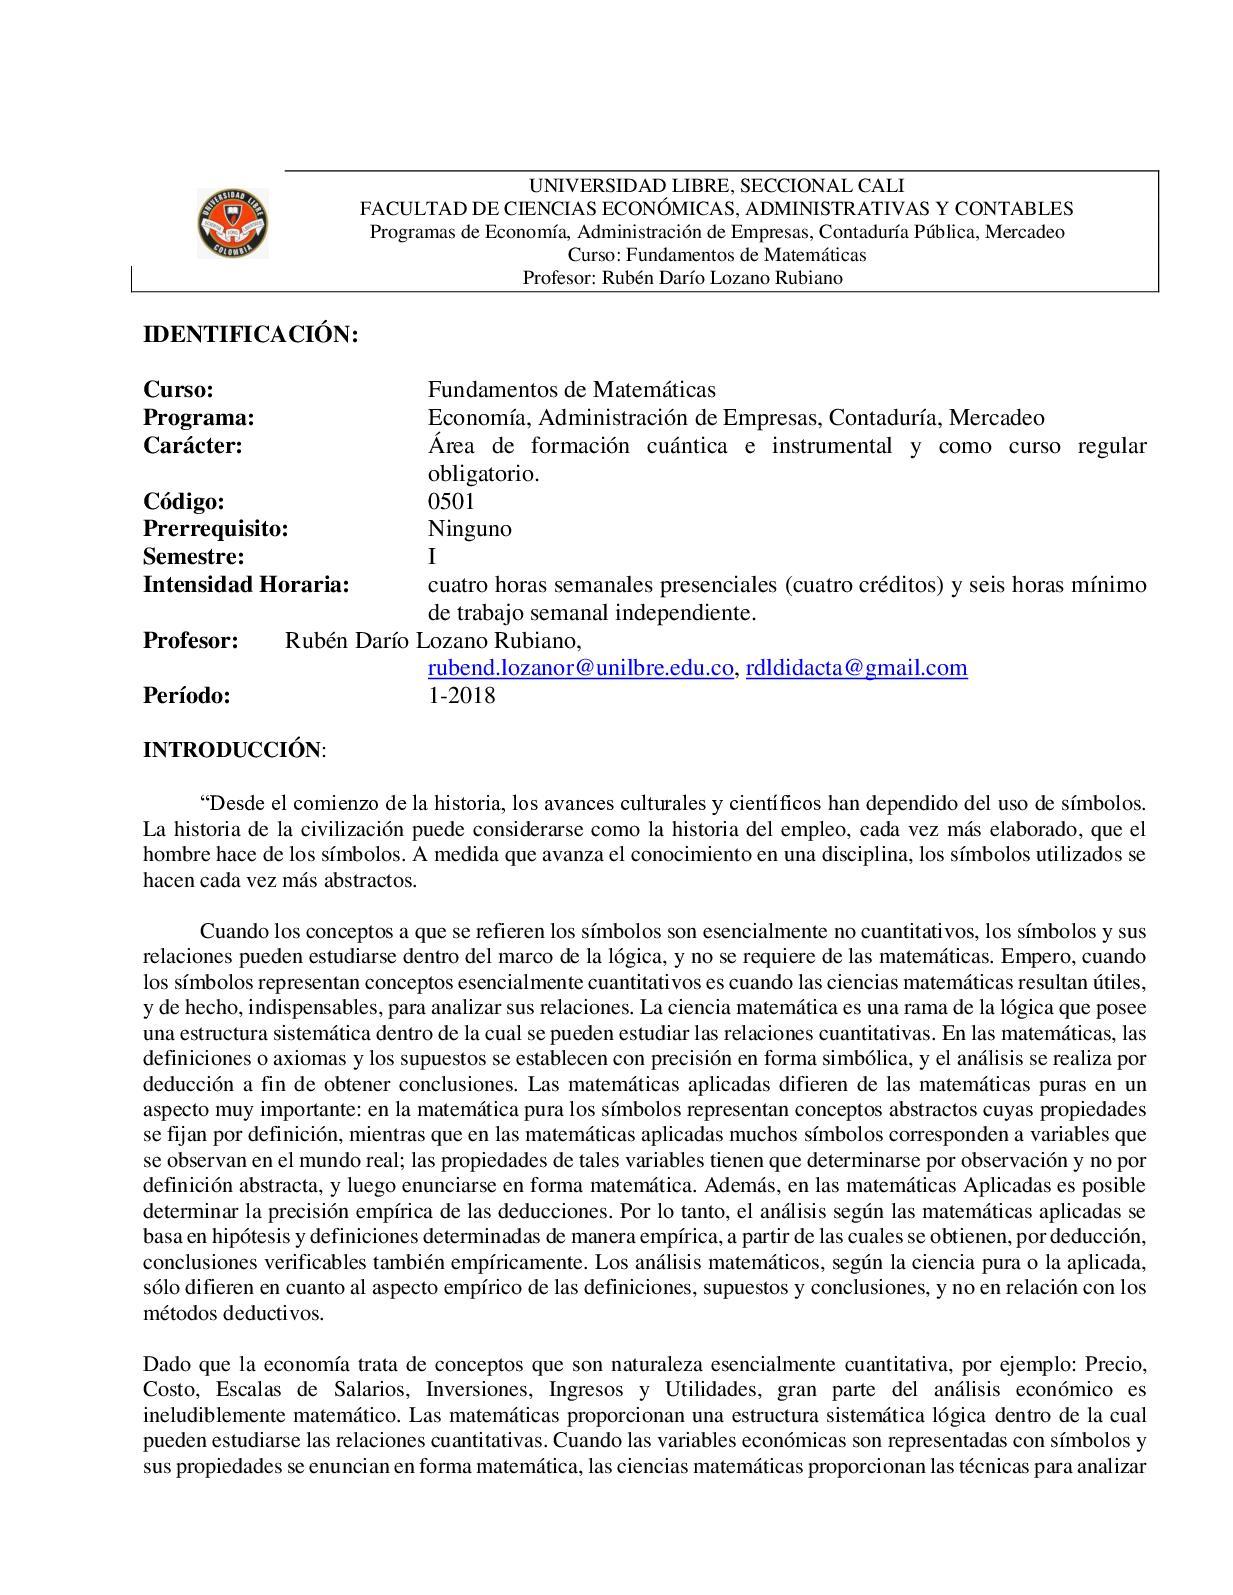 Calaméo - Plan Fundamentos De Matemáticas Universidad Libre Fceac Rdlr